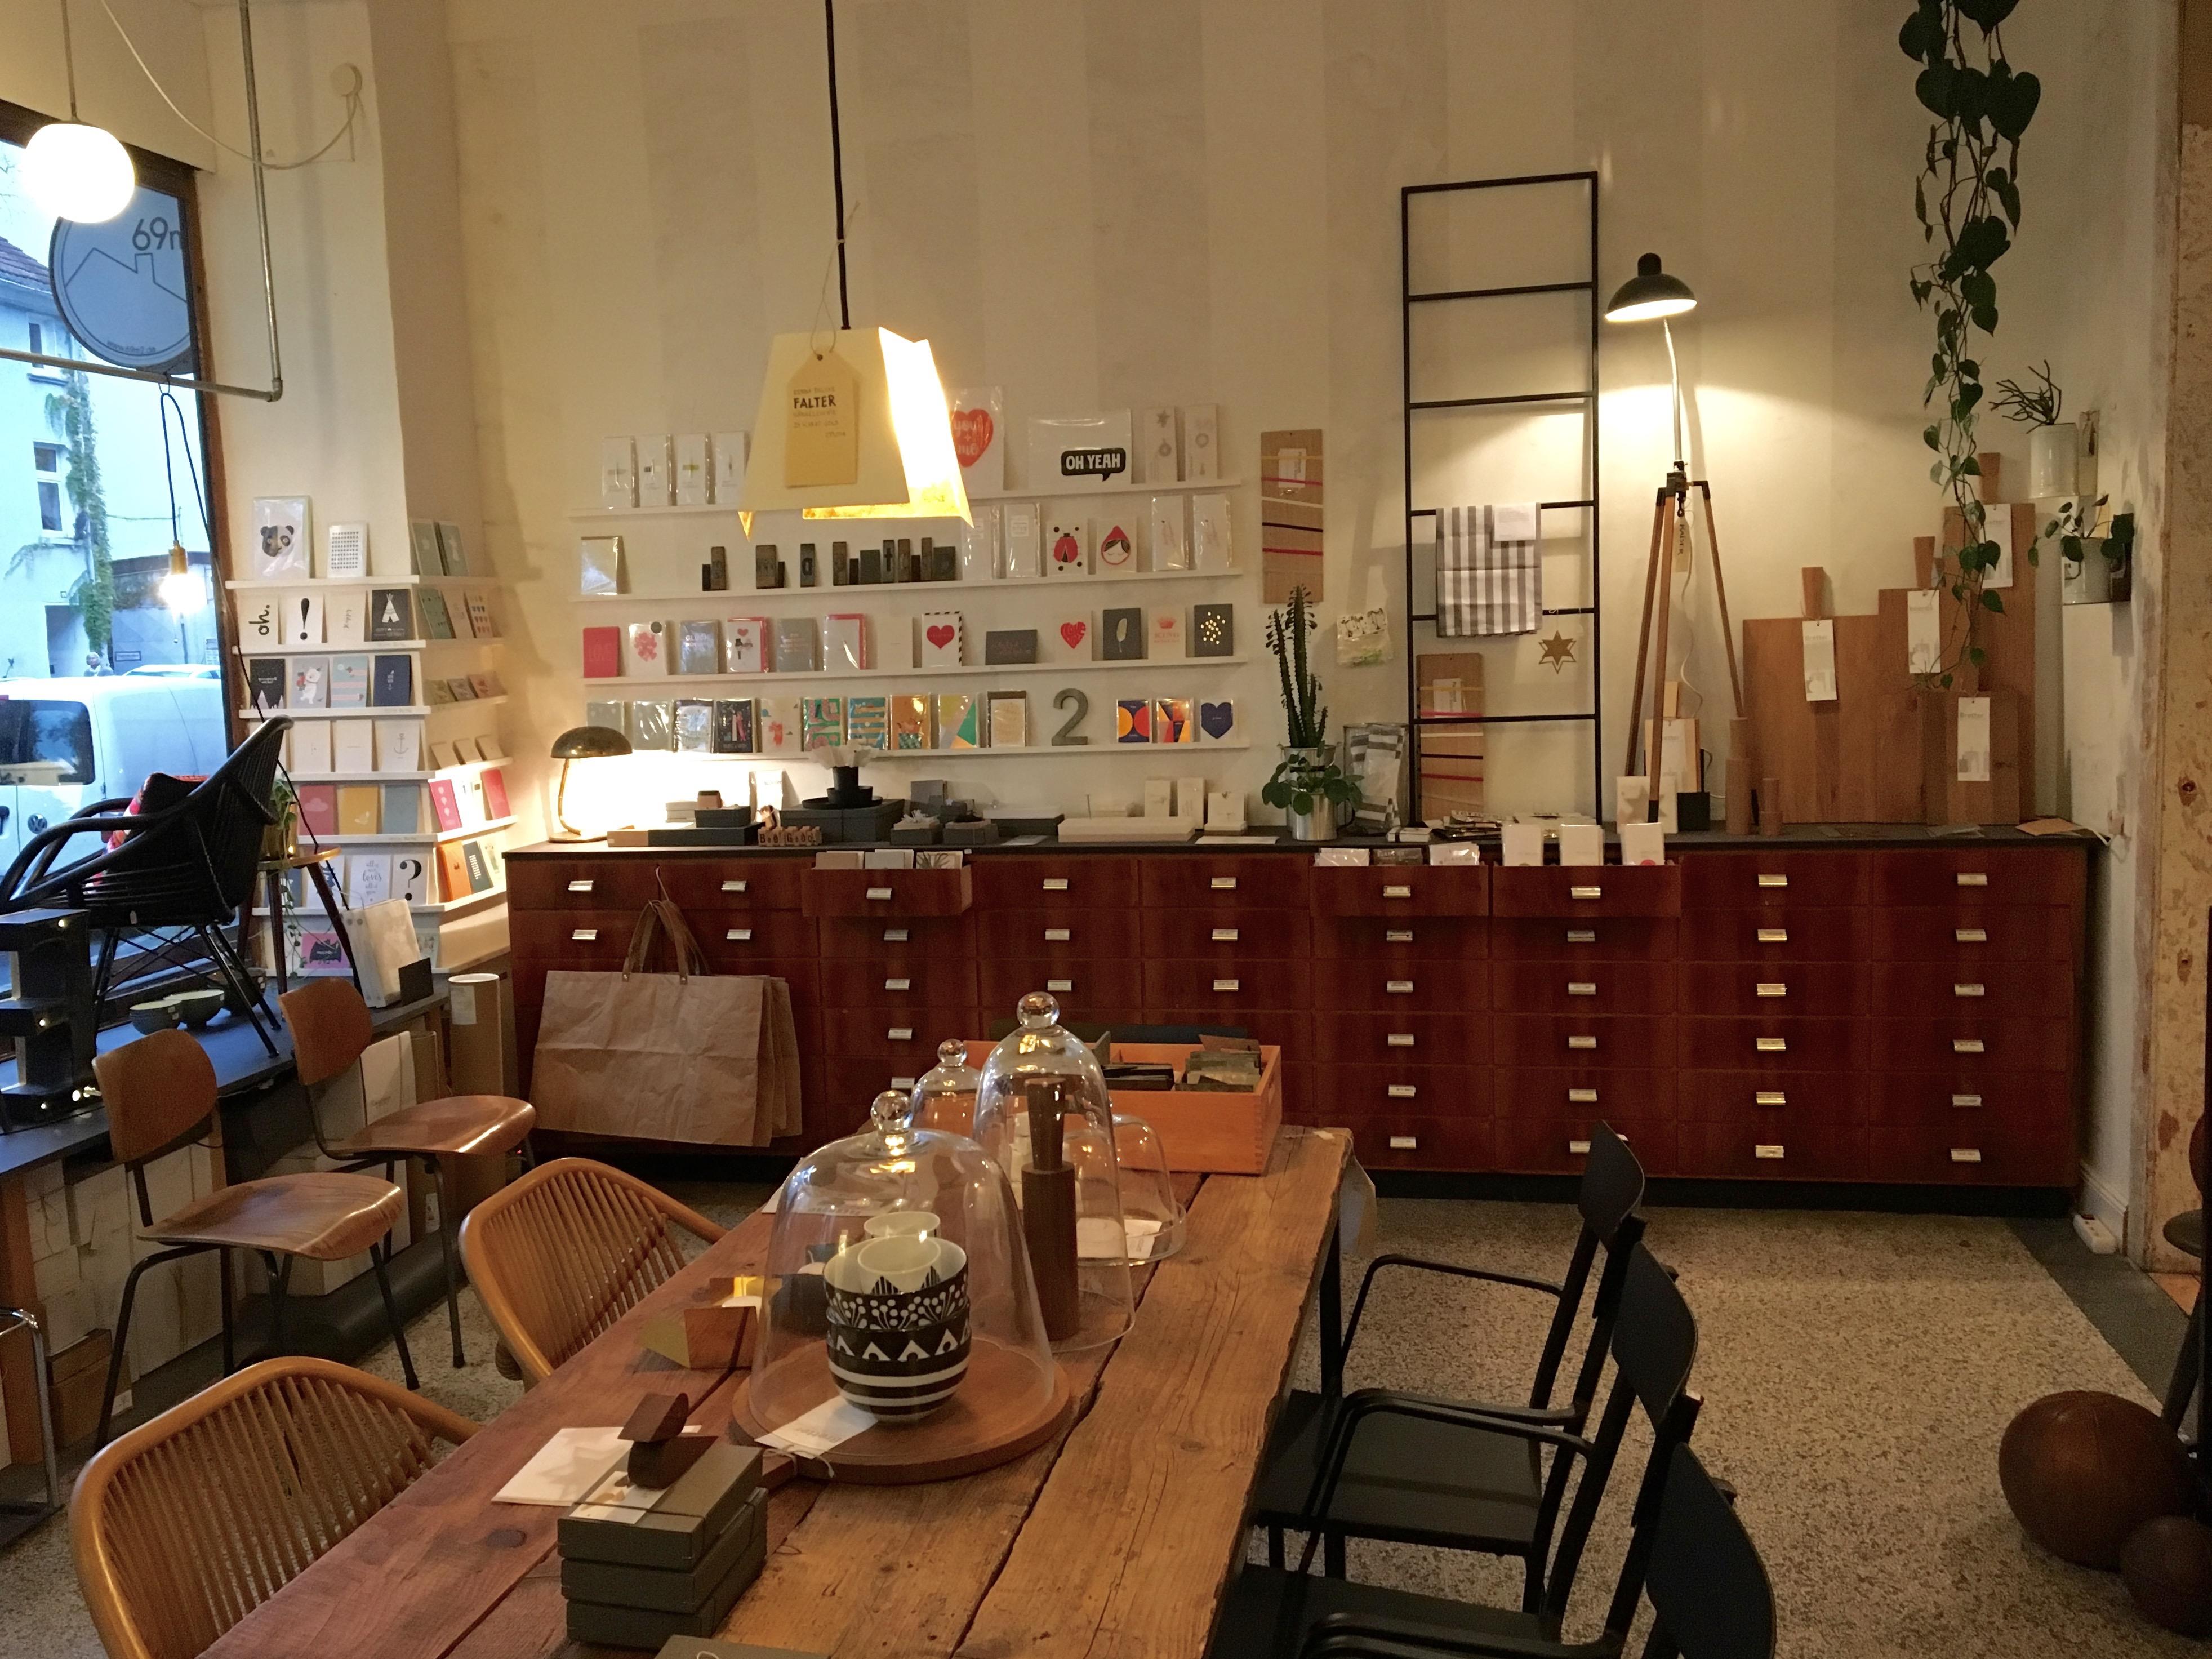 freundinnen shopping in d sseldorf flingern frau liebchen. Black Bedroom Furniture Sets. Home Design Ideas